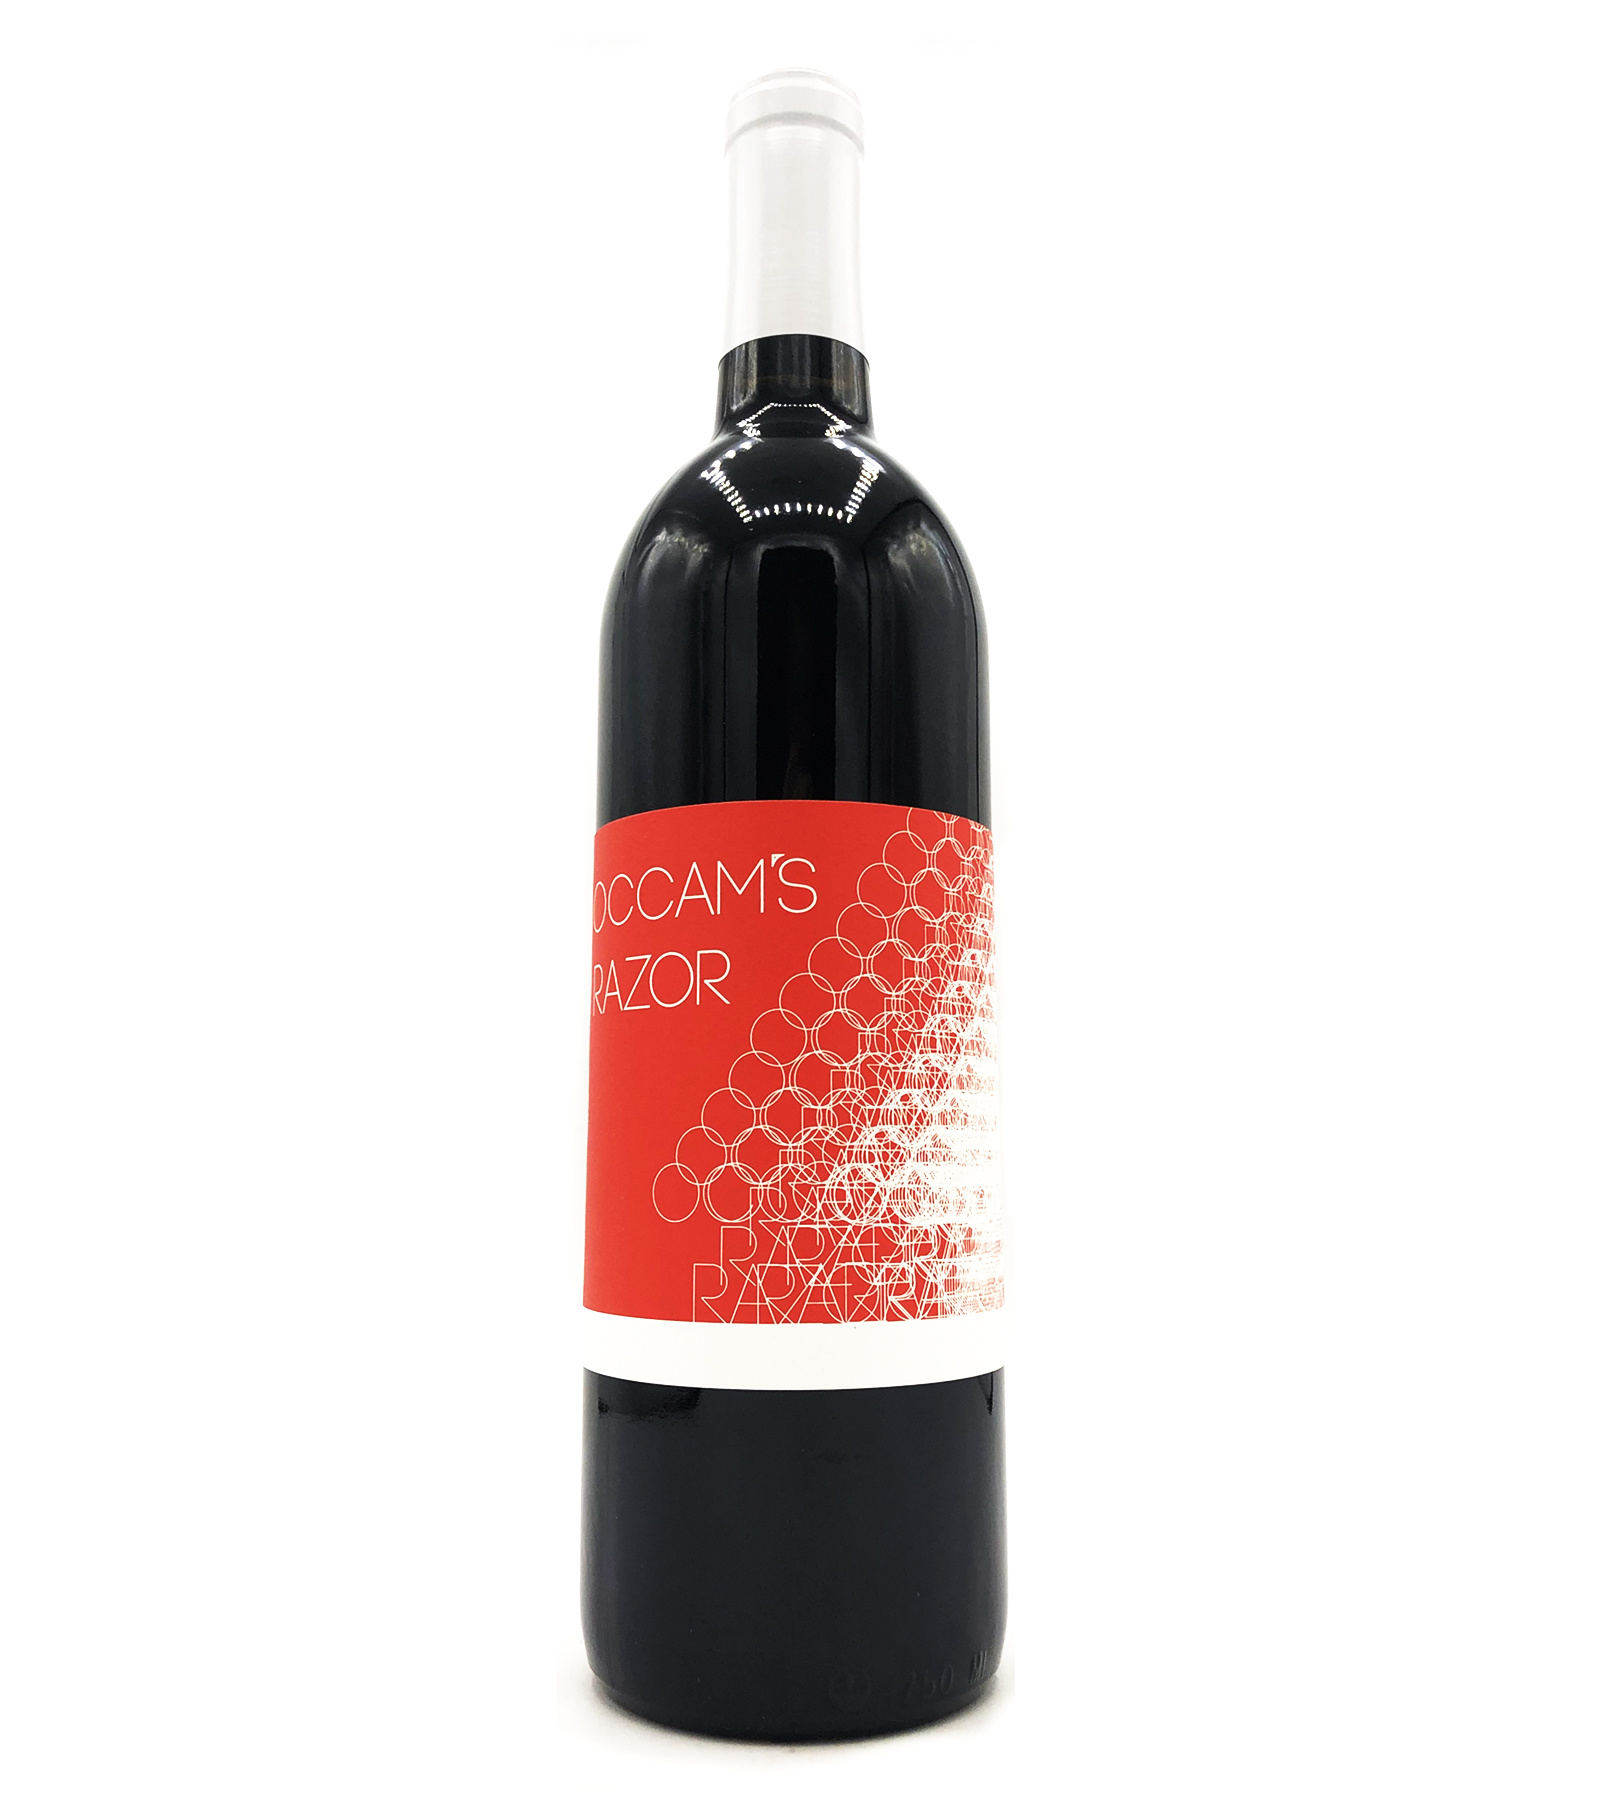 Occam's Razor 2017 Rasa Vineyards